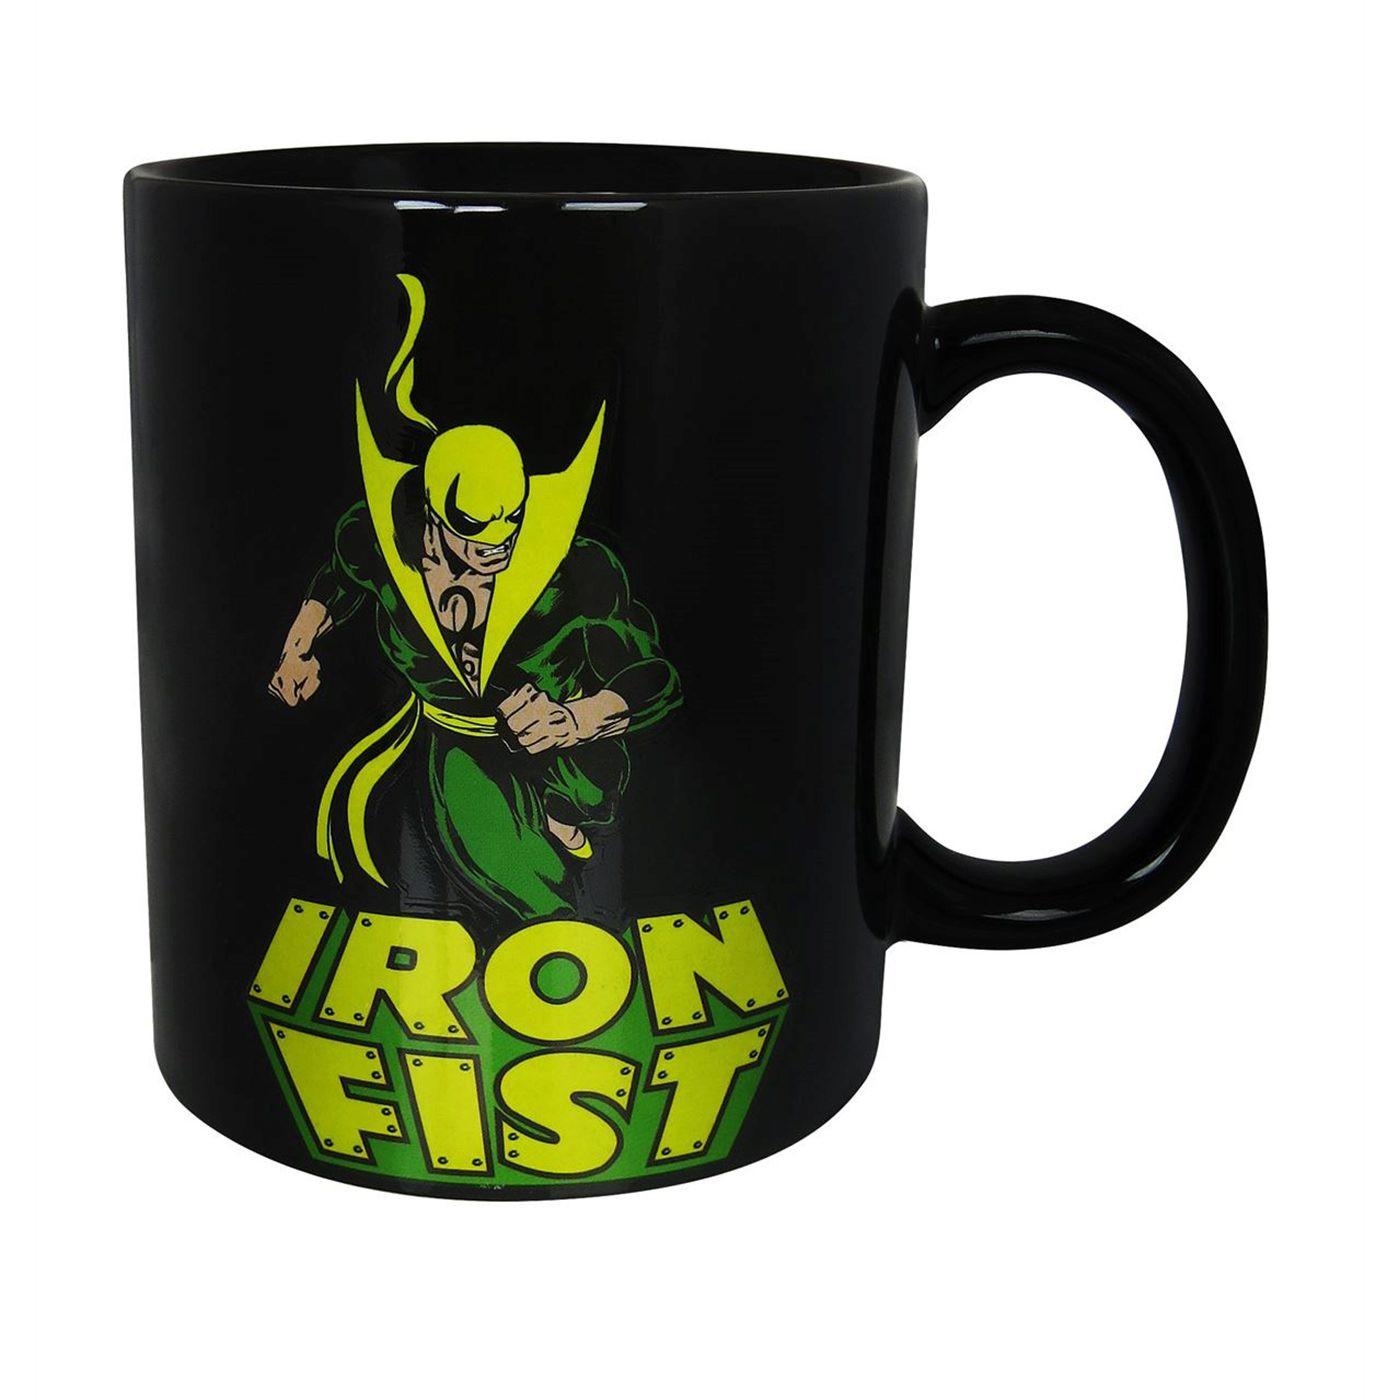 Iron Fist Image 11oz Mug